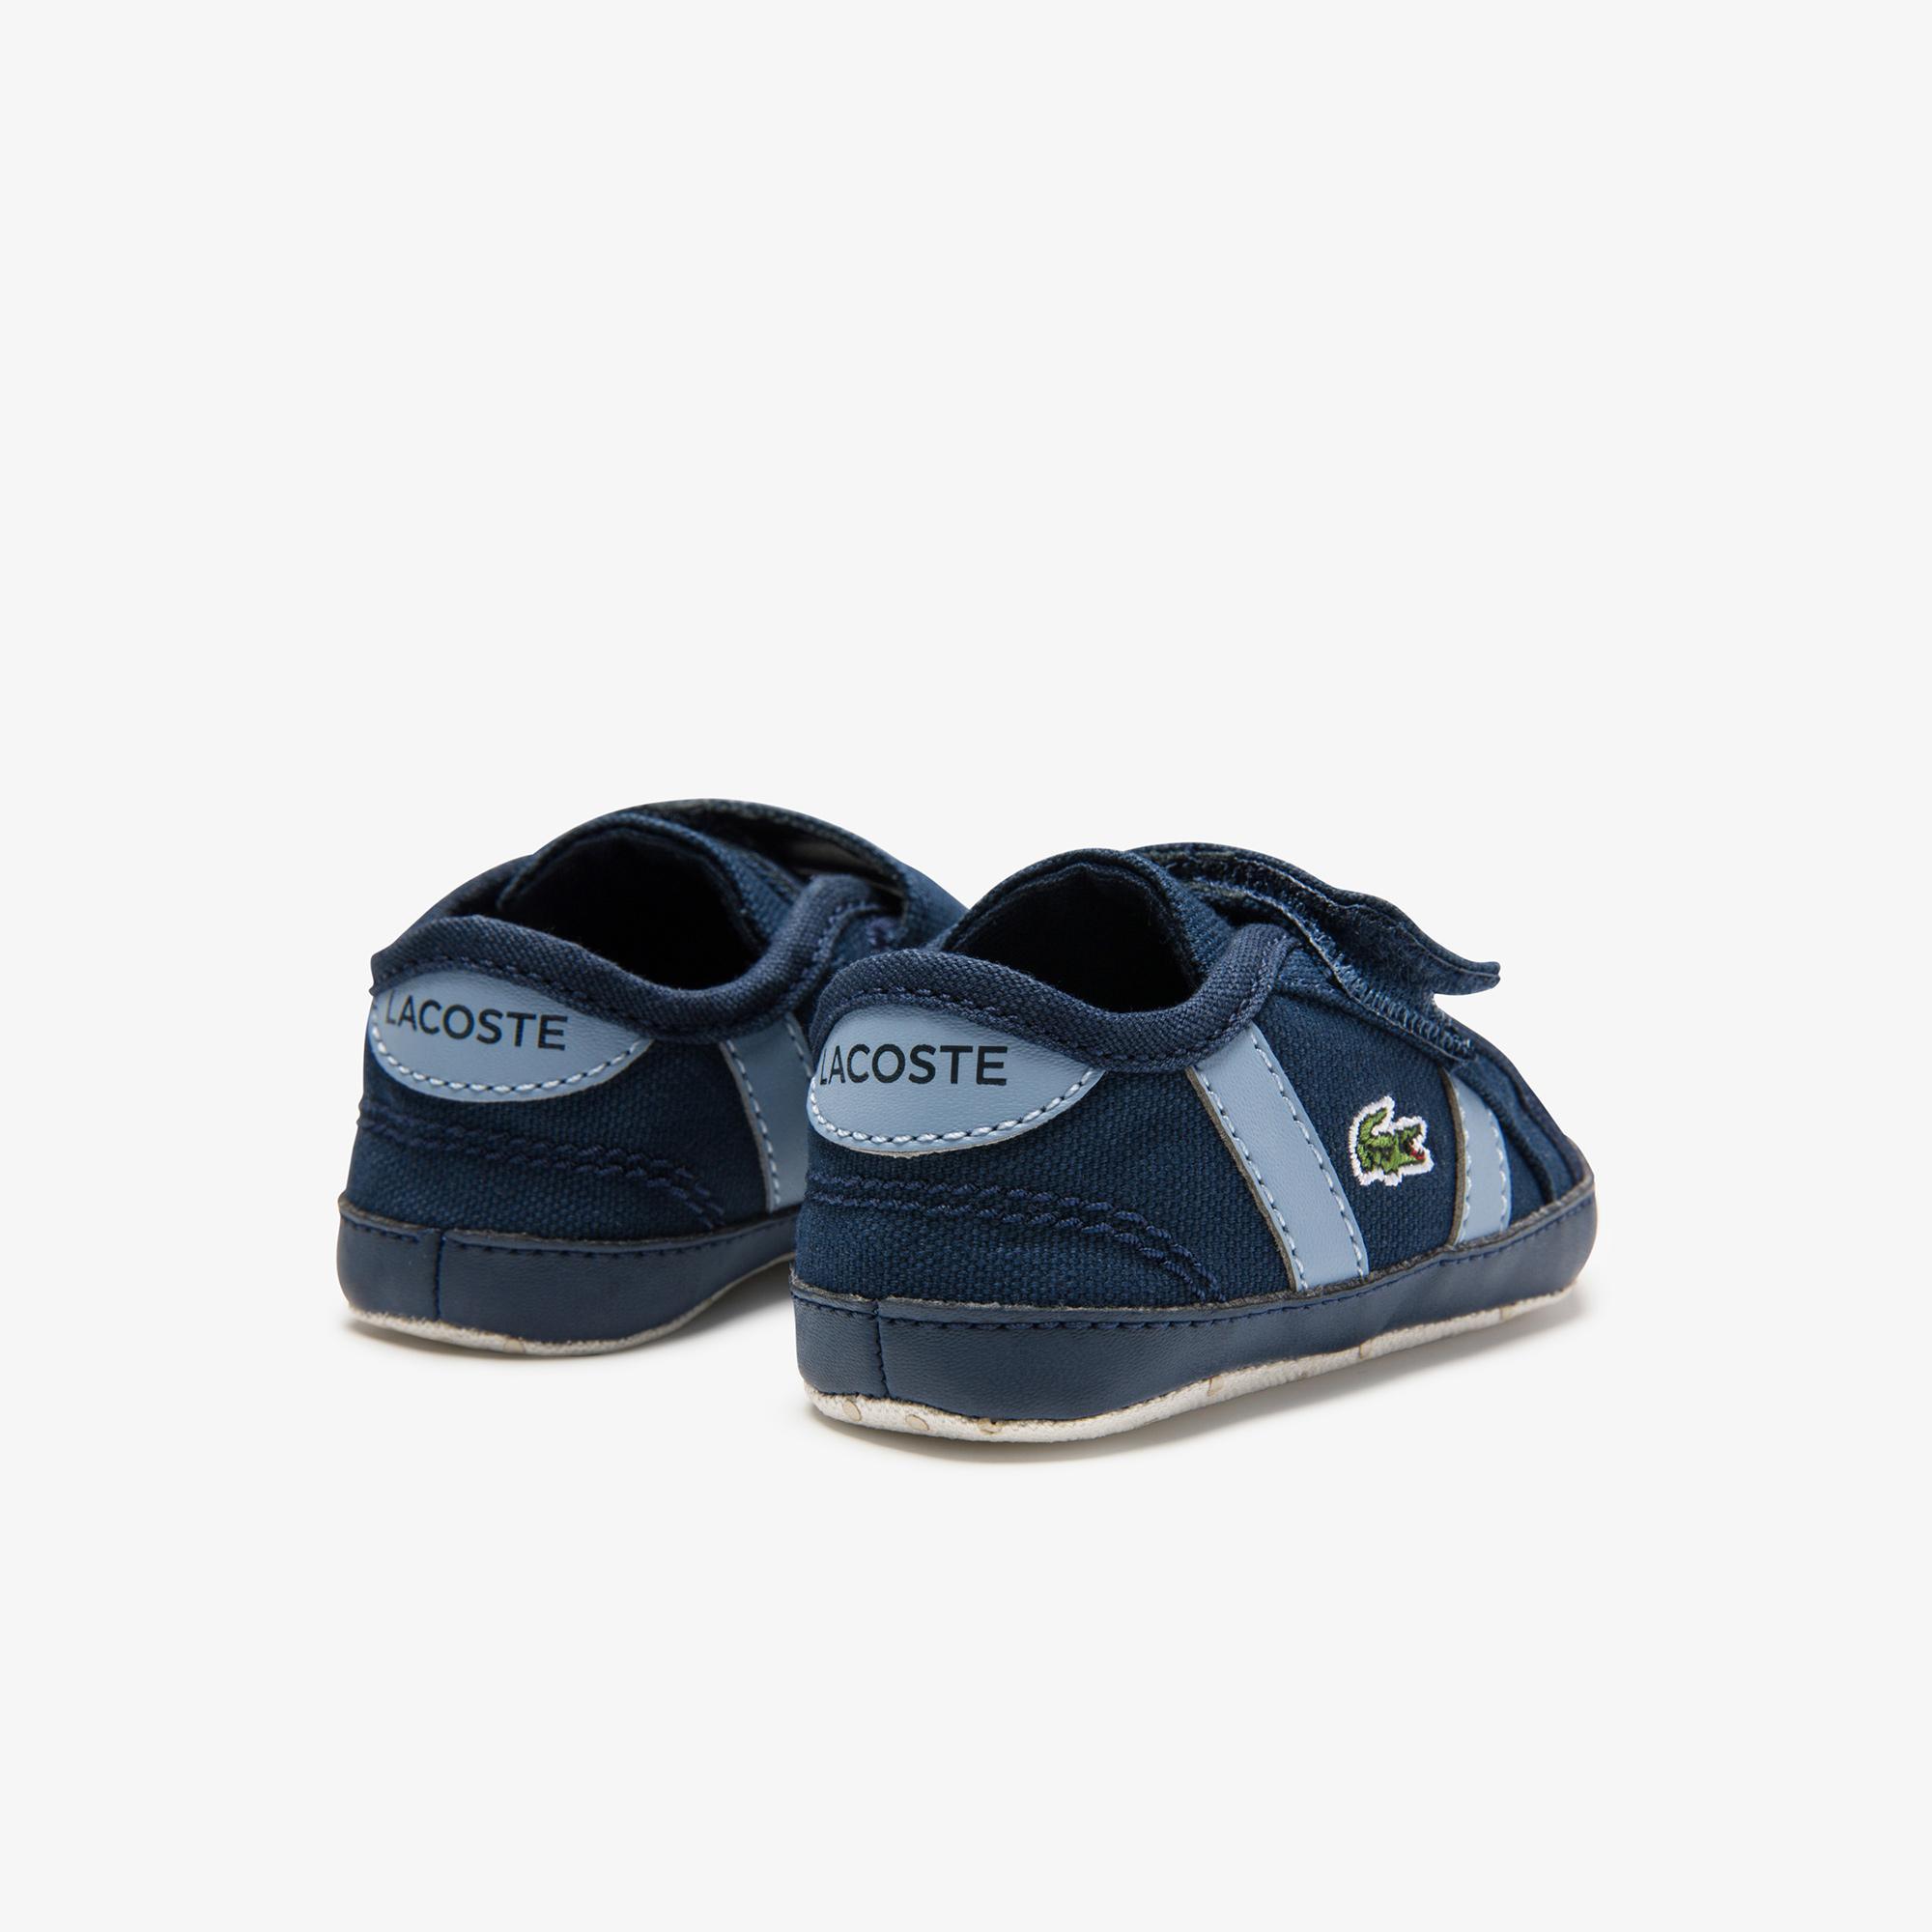 Lacoste Sideline Crib 0120 1 Cub Çocuk Lacivert - Mavi Sneaker